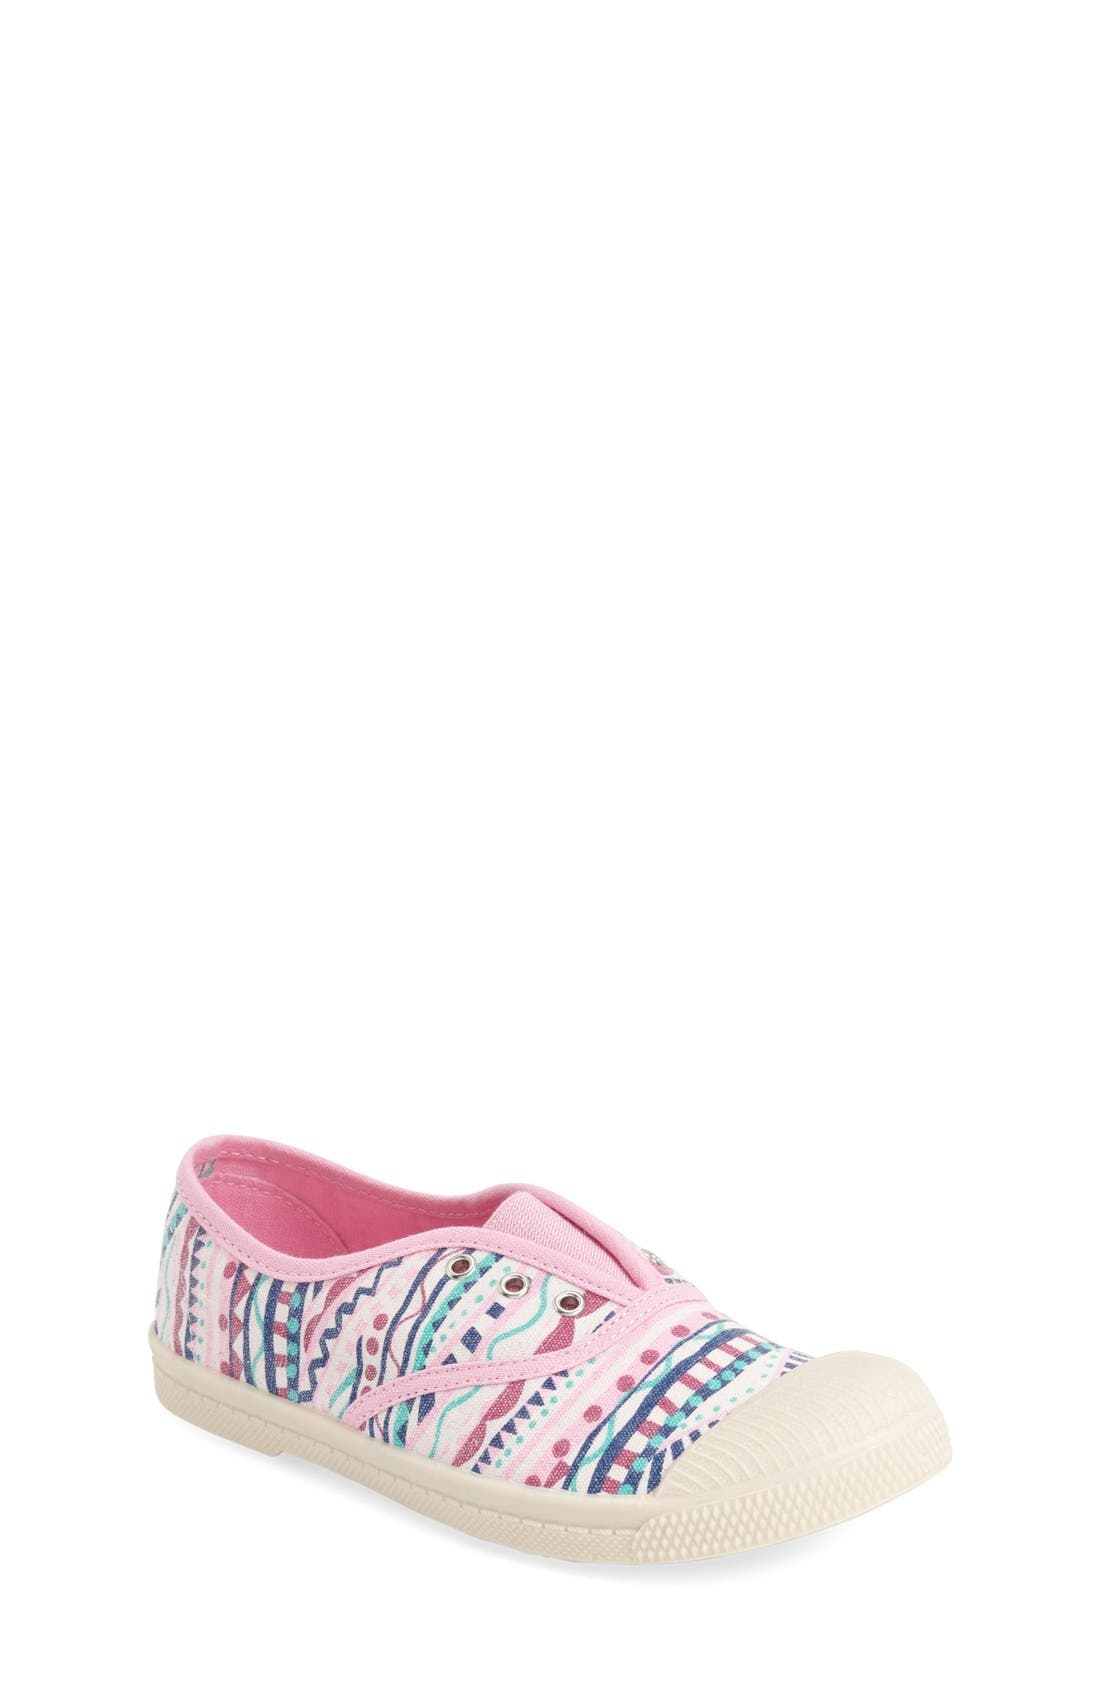 Alternate Image 1 Selected - Tucker + Tate 'Marin' Canvas Slip-On Sneaker (Toddler, Little Kid & Big Kid)